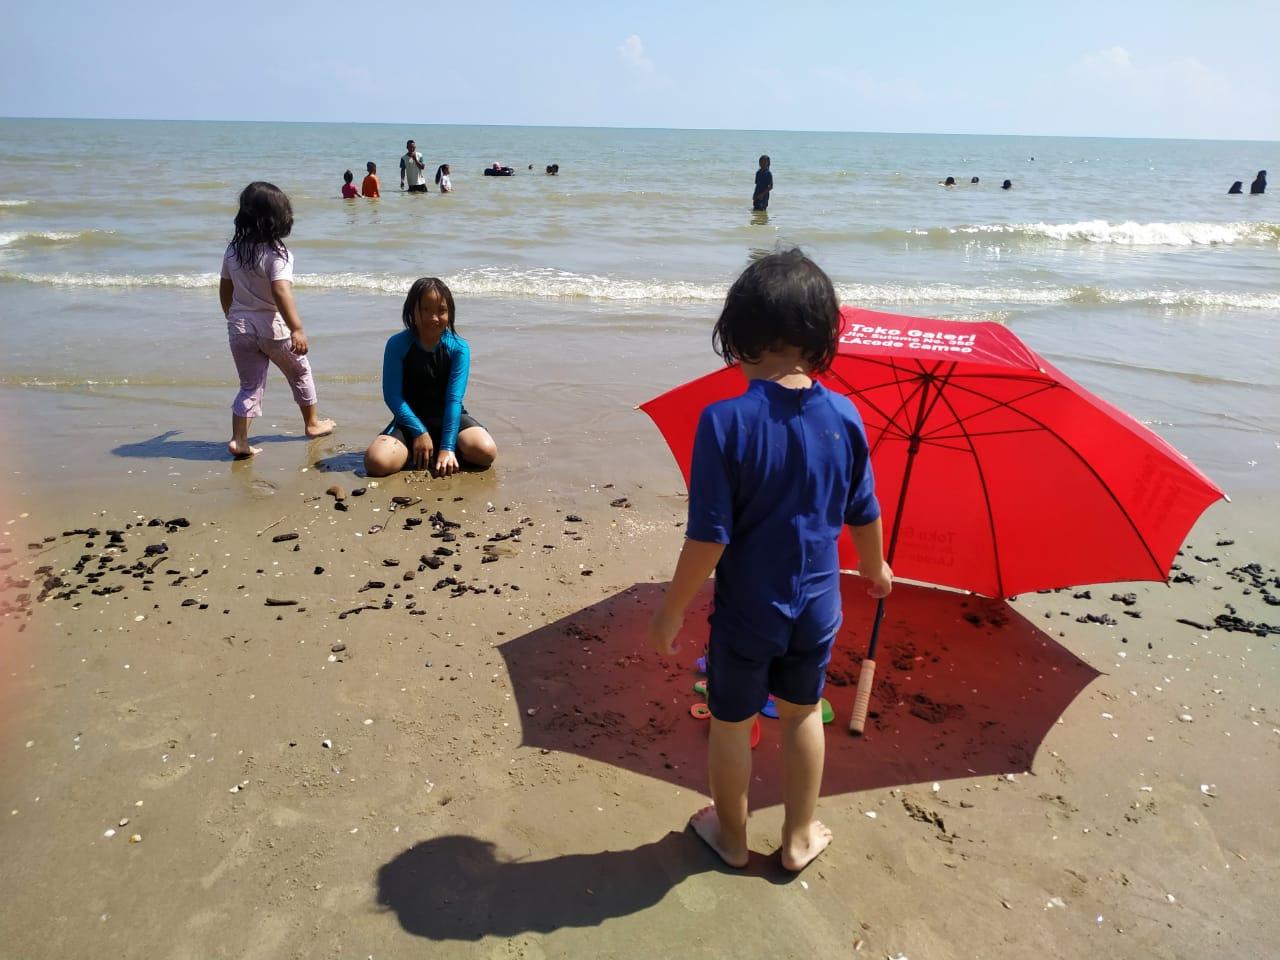 Wisata Pantai Kuala Peudawa Puntong Indah Dan Mempesona